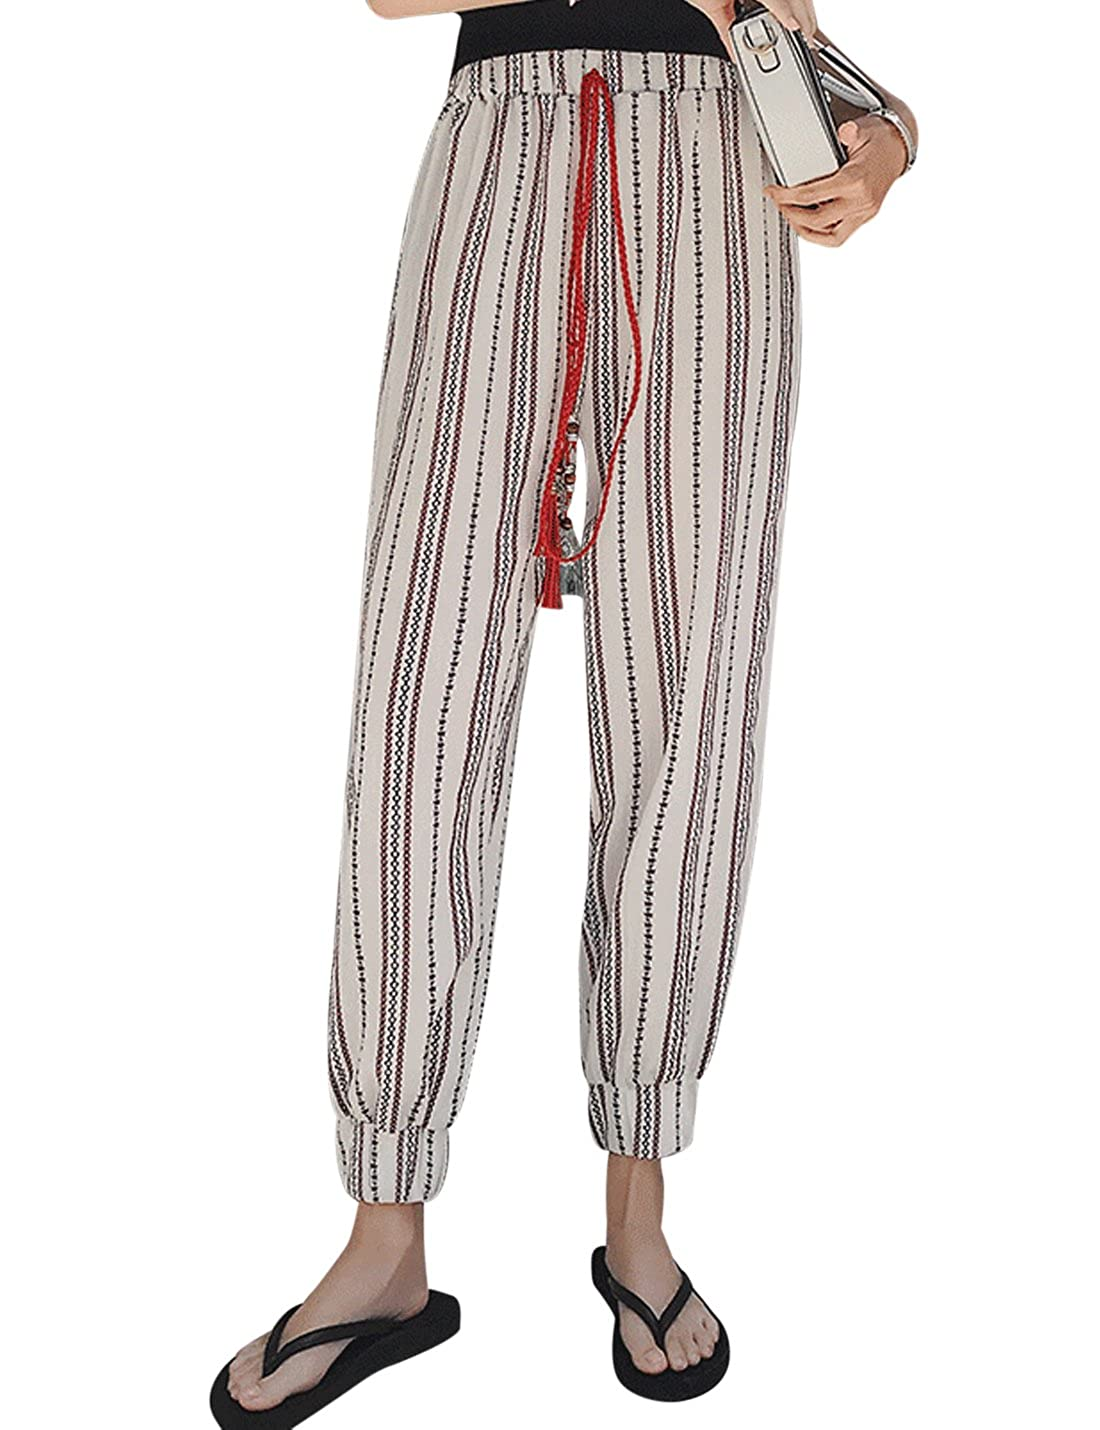 8f2077cb7c2 Uaneo Women s High Stretch Waist Stripe Flowy Palazzo Long Harem Pants with  Drawstring at Amazon Women s Clothing store